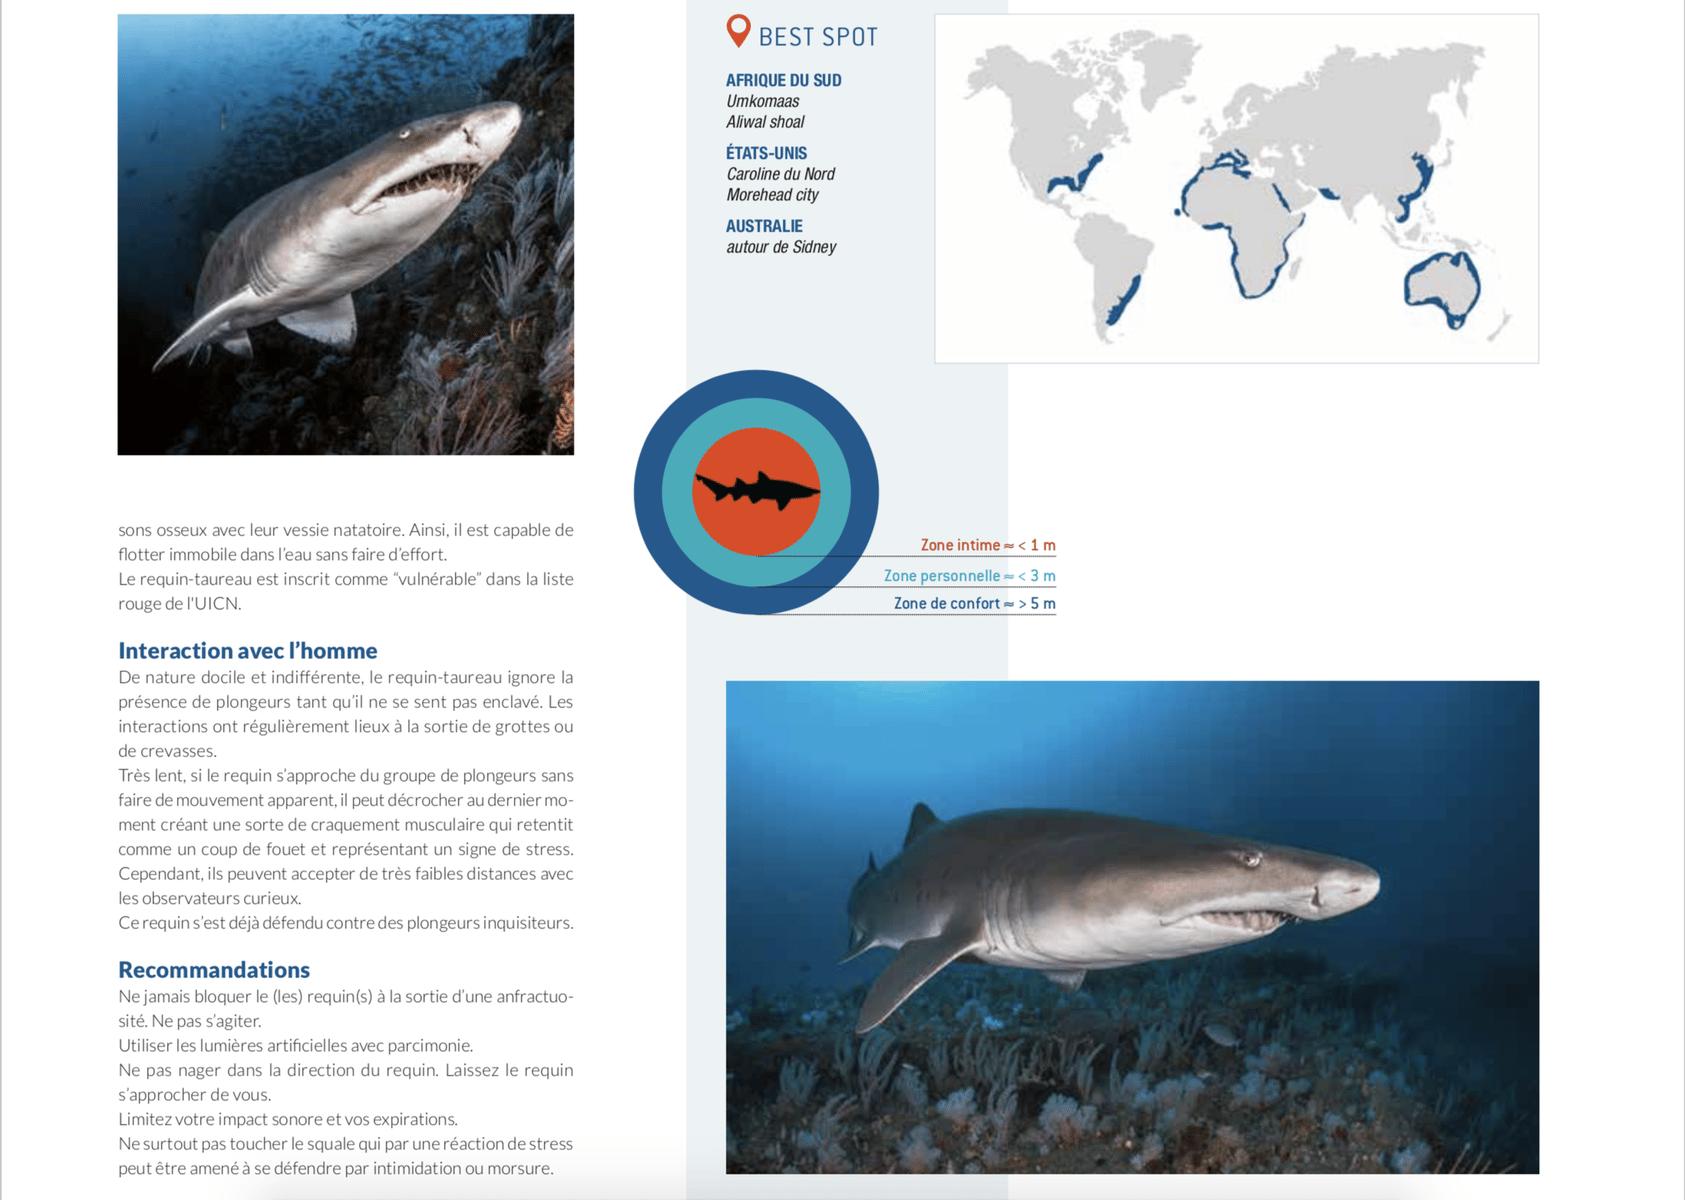 fiche requin taureau best spot